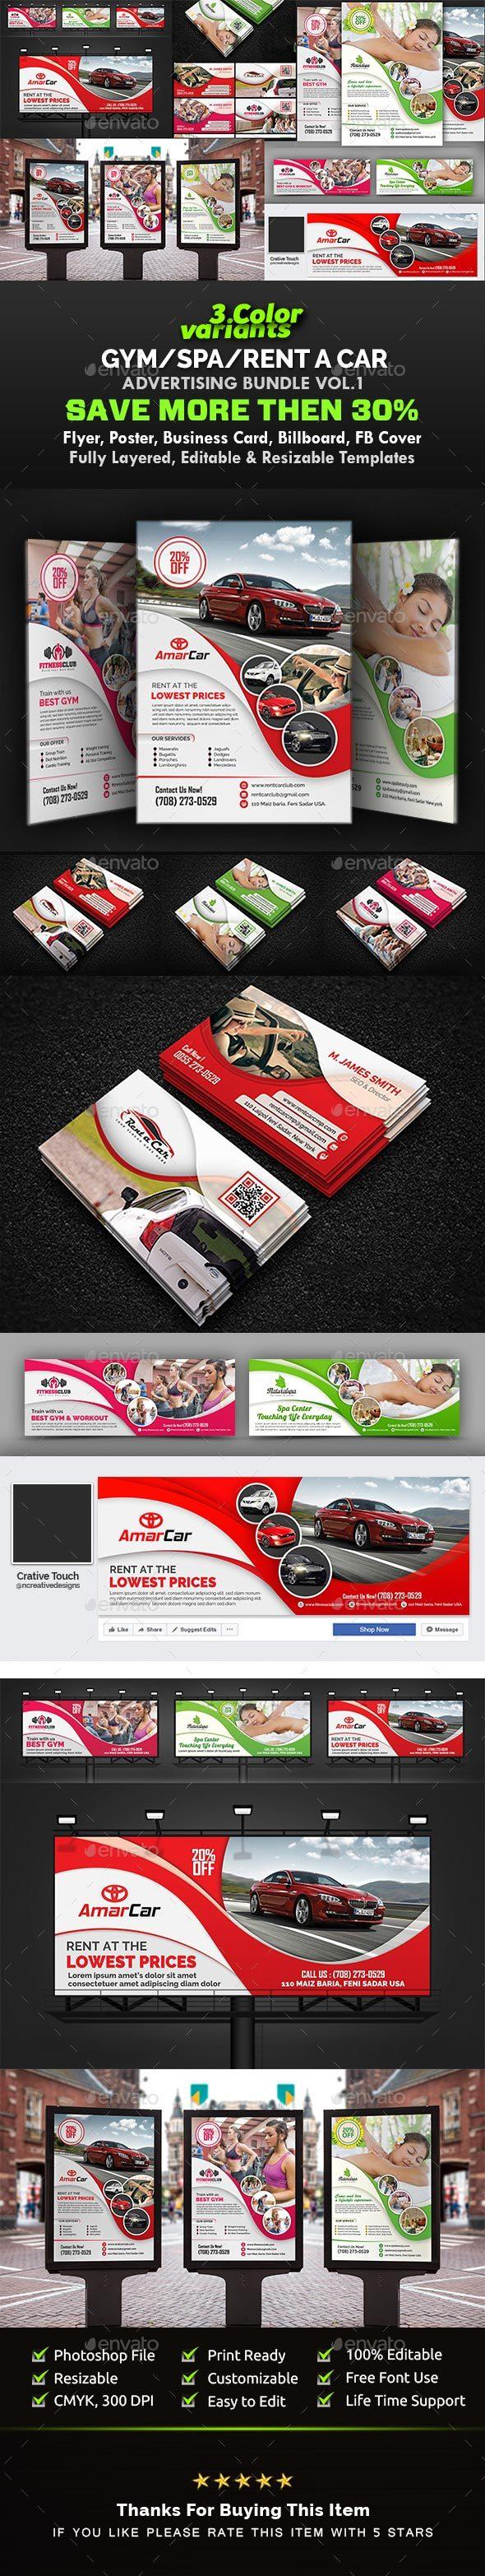 GraphicRiver Gym Ad Bundle Spa Ad Bundle I Car Advertising Bundle Vol.1 20817110